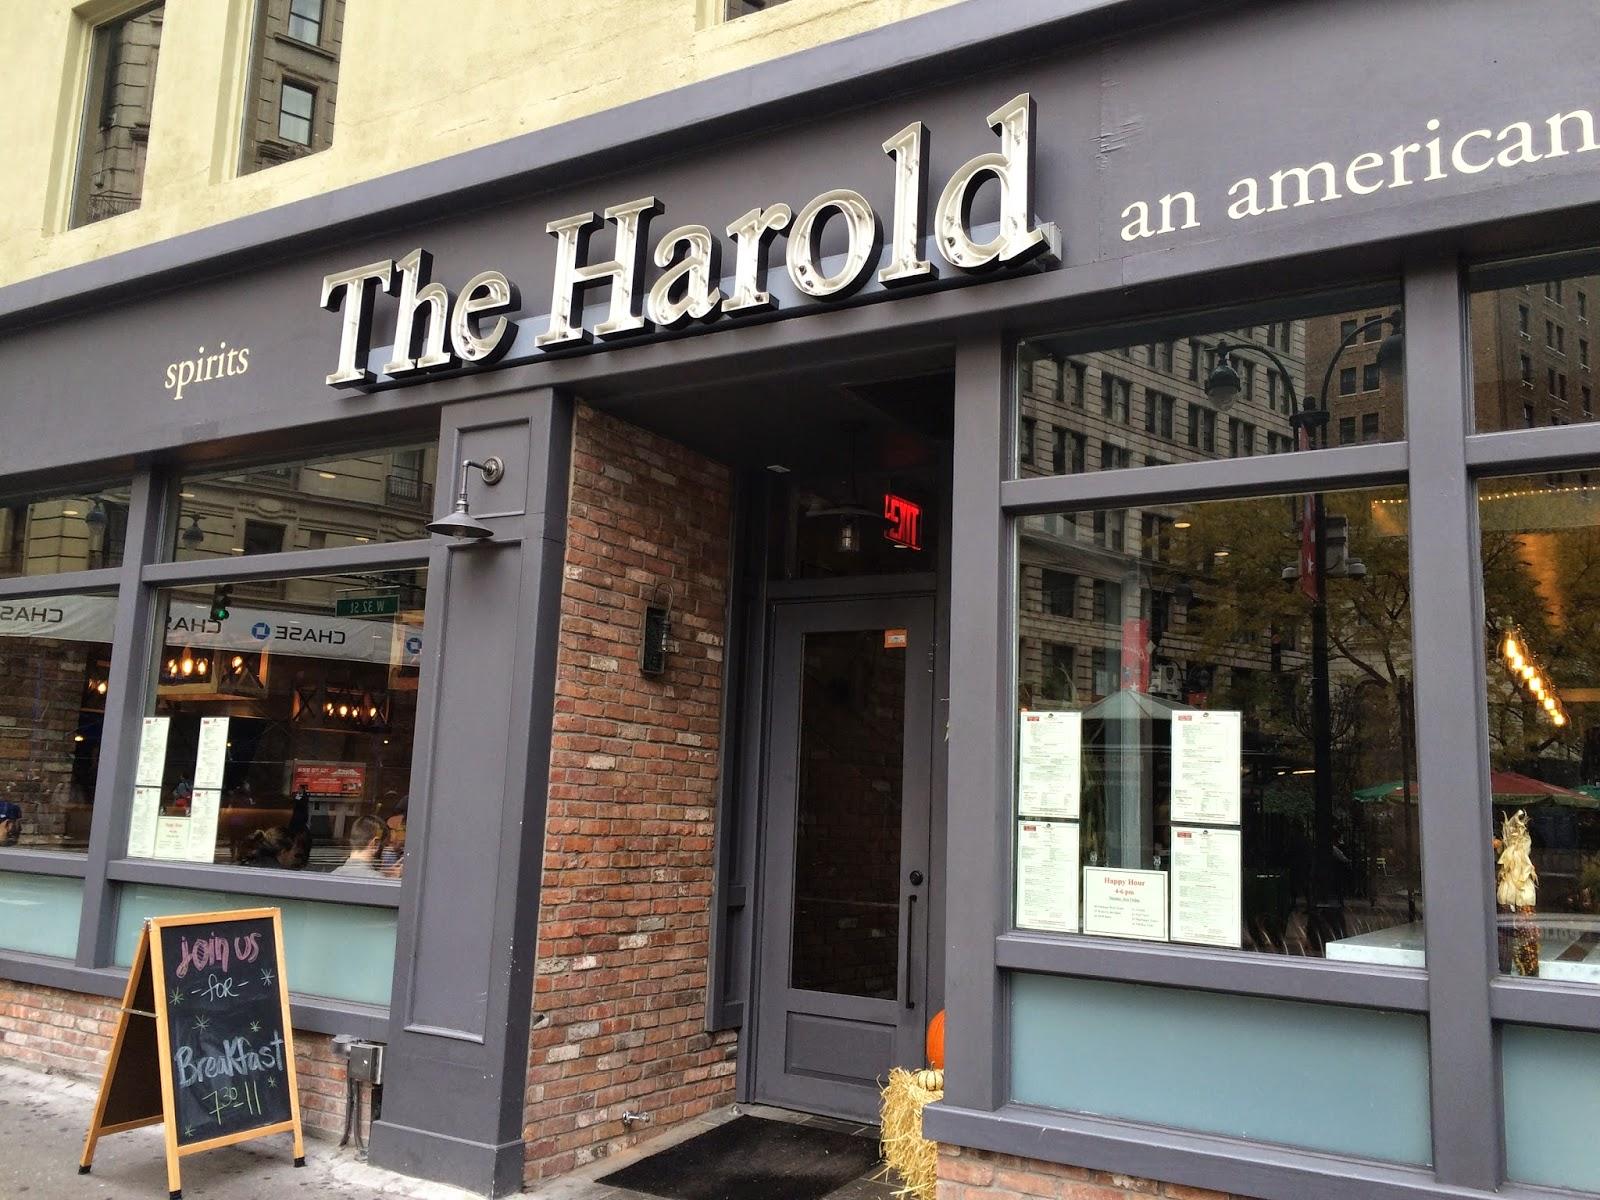 545. The Harold